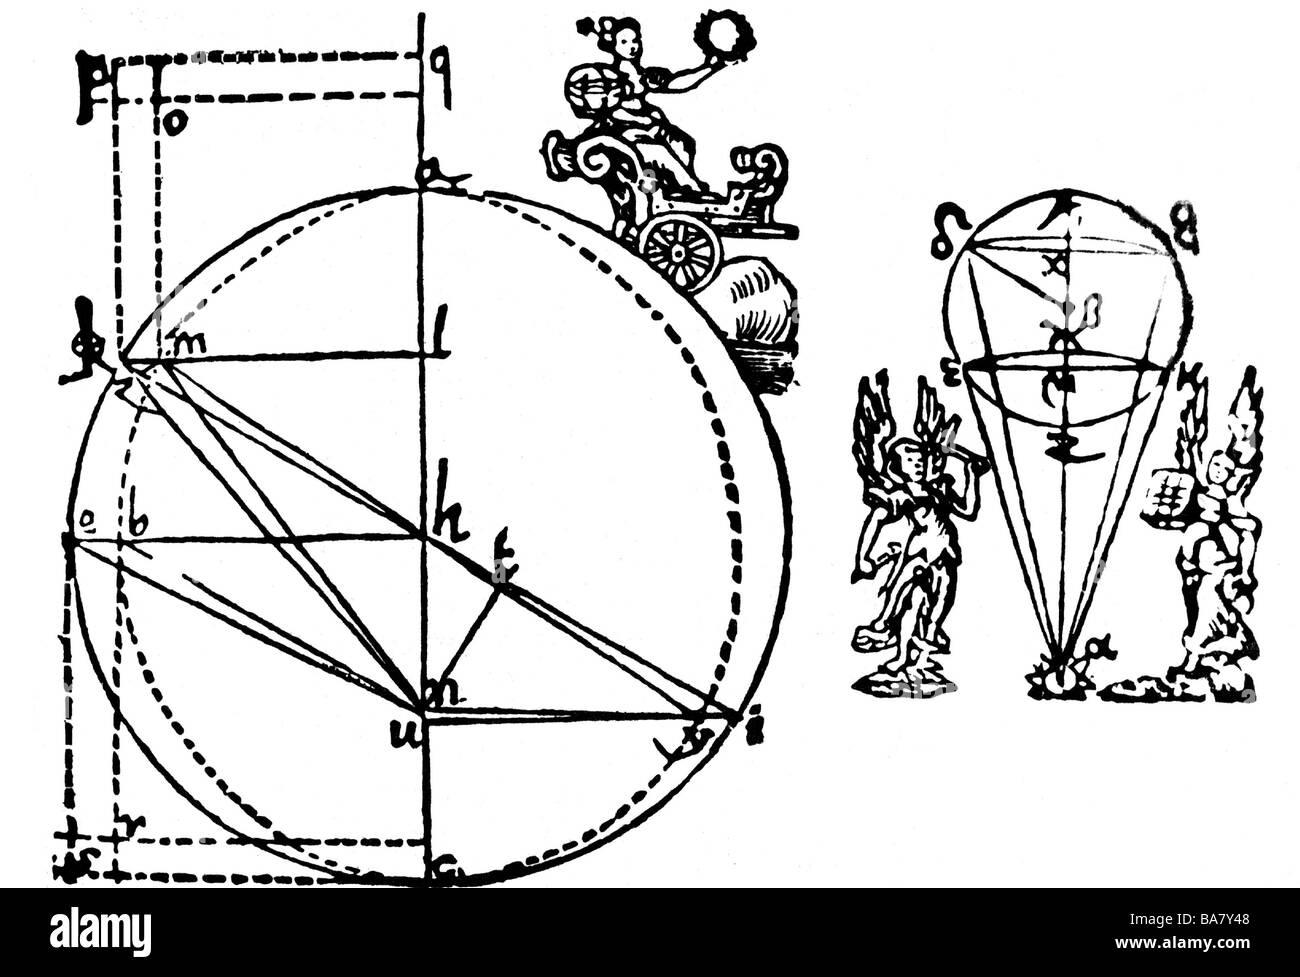 JOHANNES KEPLER ASTRONOMIA NOVA EPUB DOWNLOAD